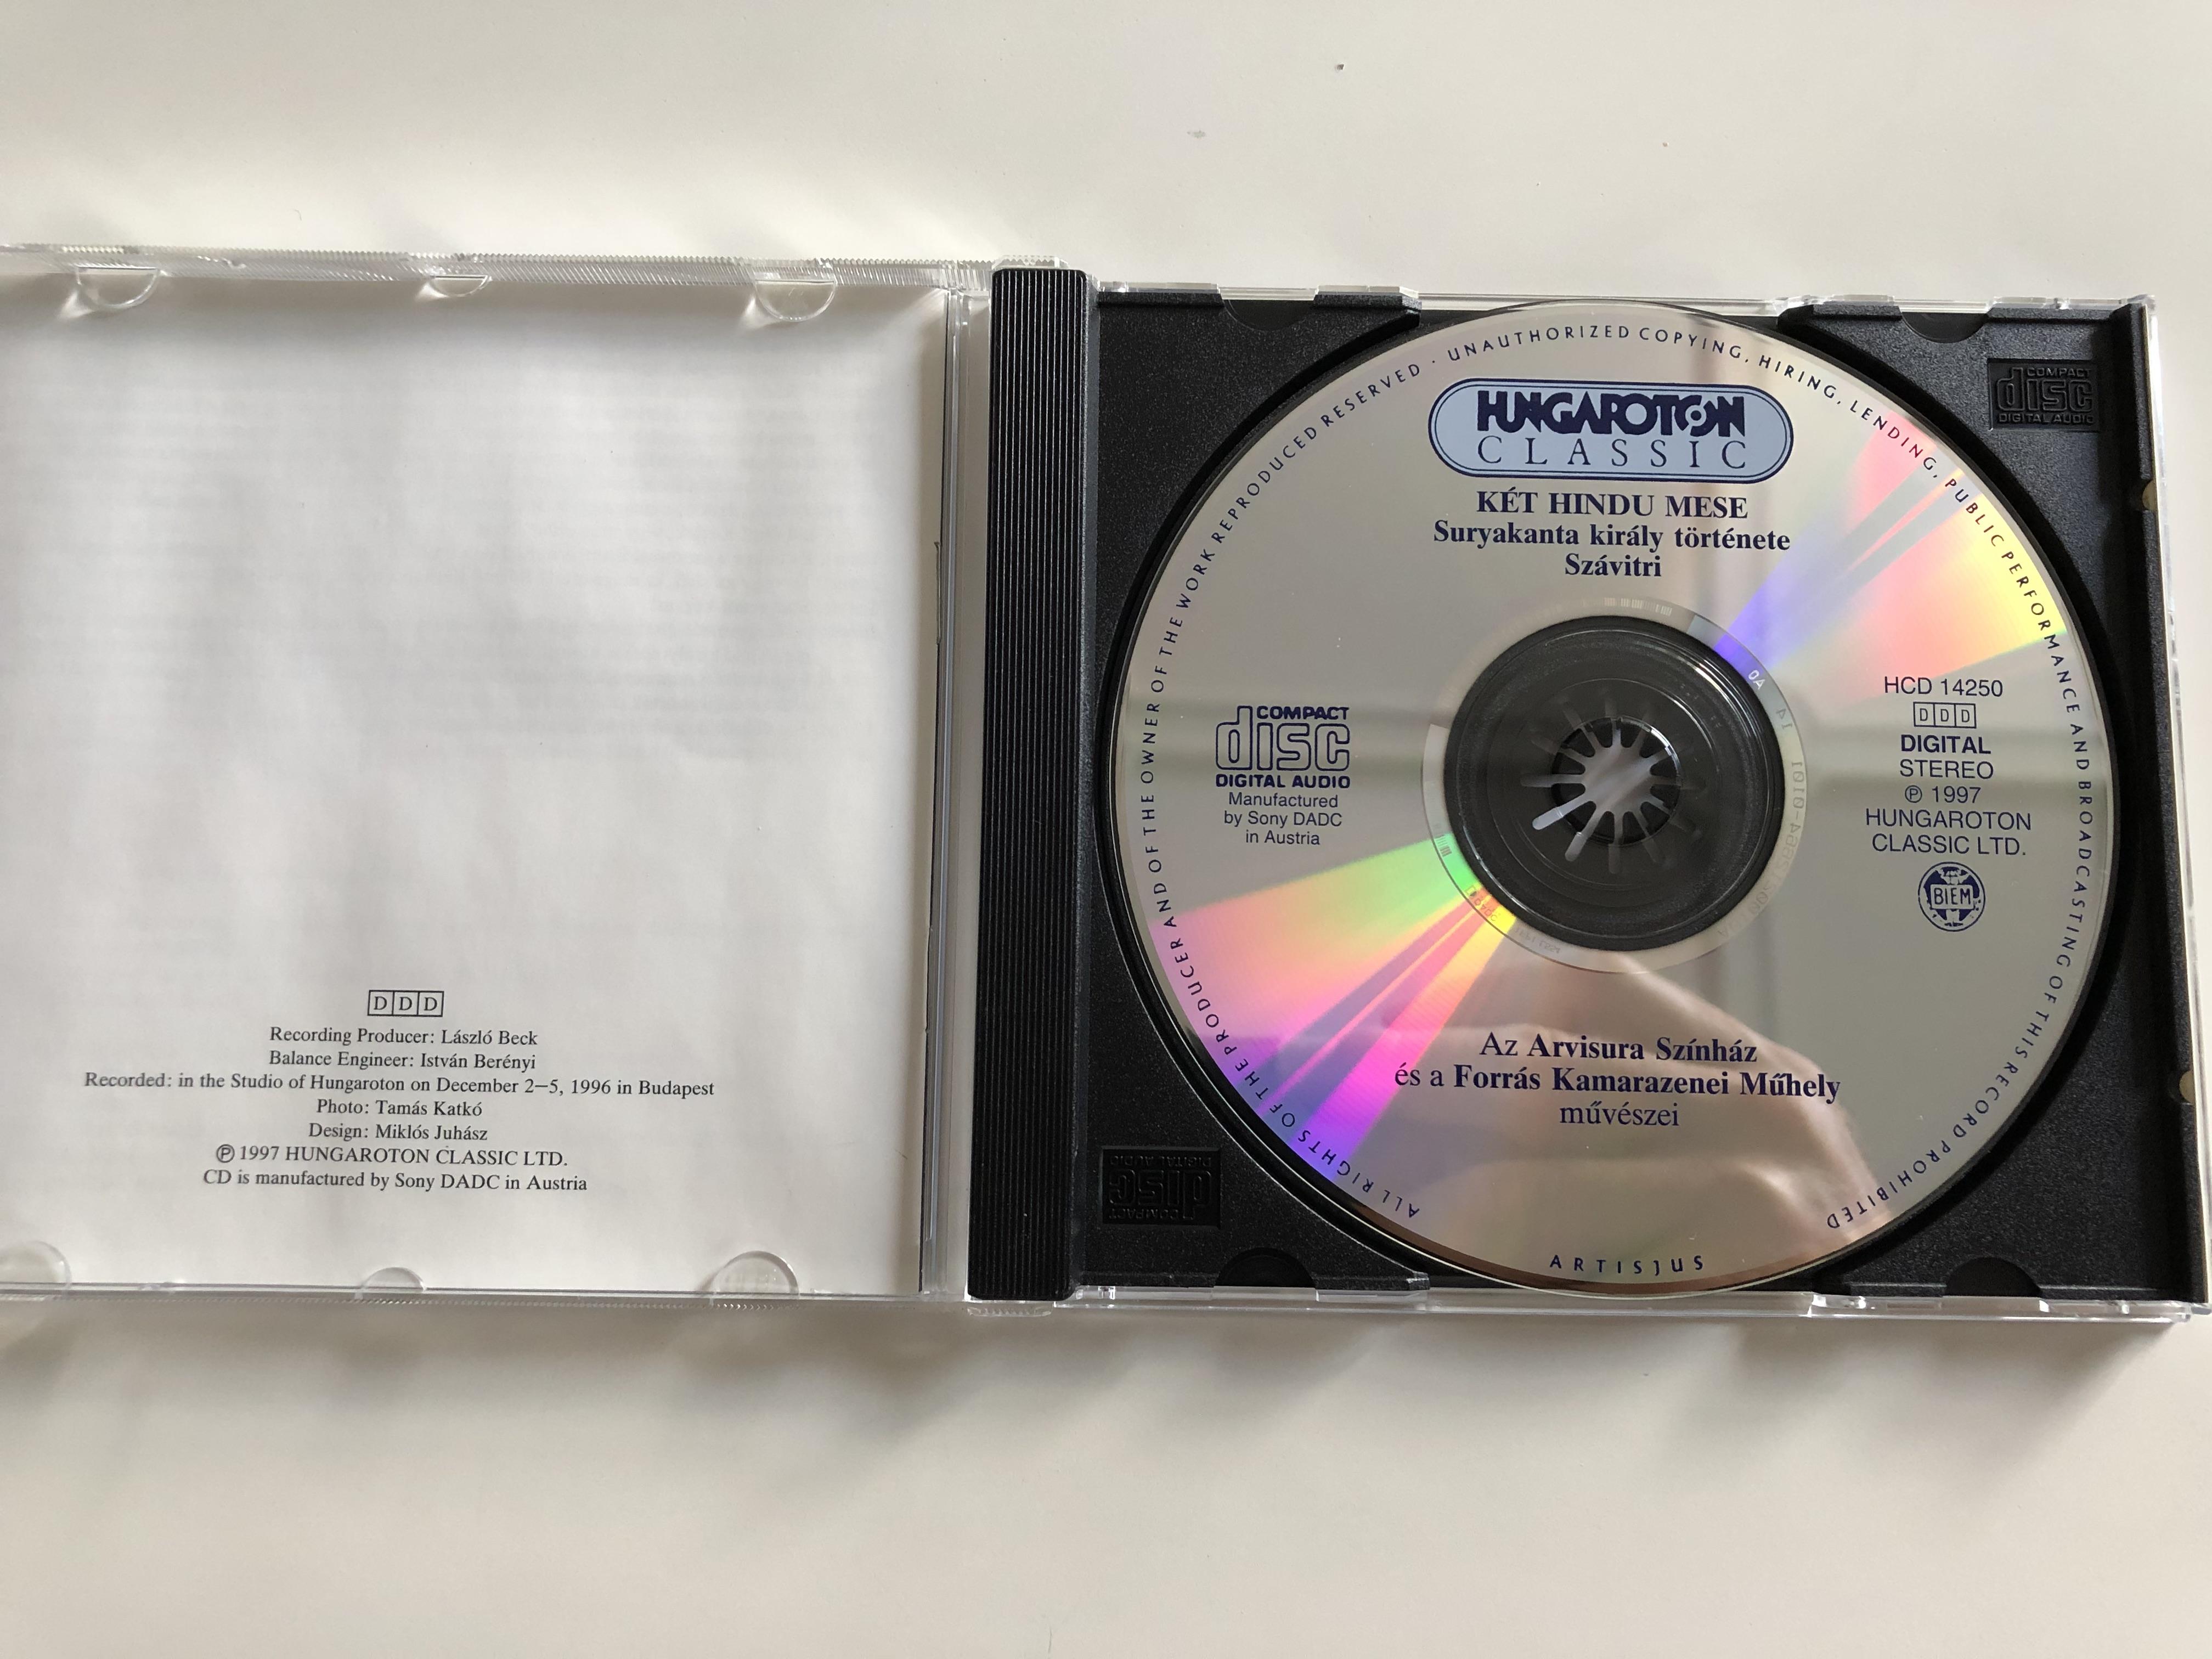 k-t-hindu-mese-suryakanta-kir-ly-t-rt-nete-sz-vitri-arvisura-sz-nh-z-forr-s-kamarazenei-m-hely-hungaroton-classic-audio-cd-1997-hcd-14250-7-.jpg